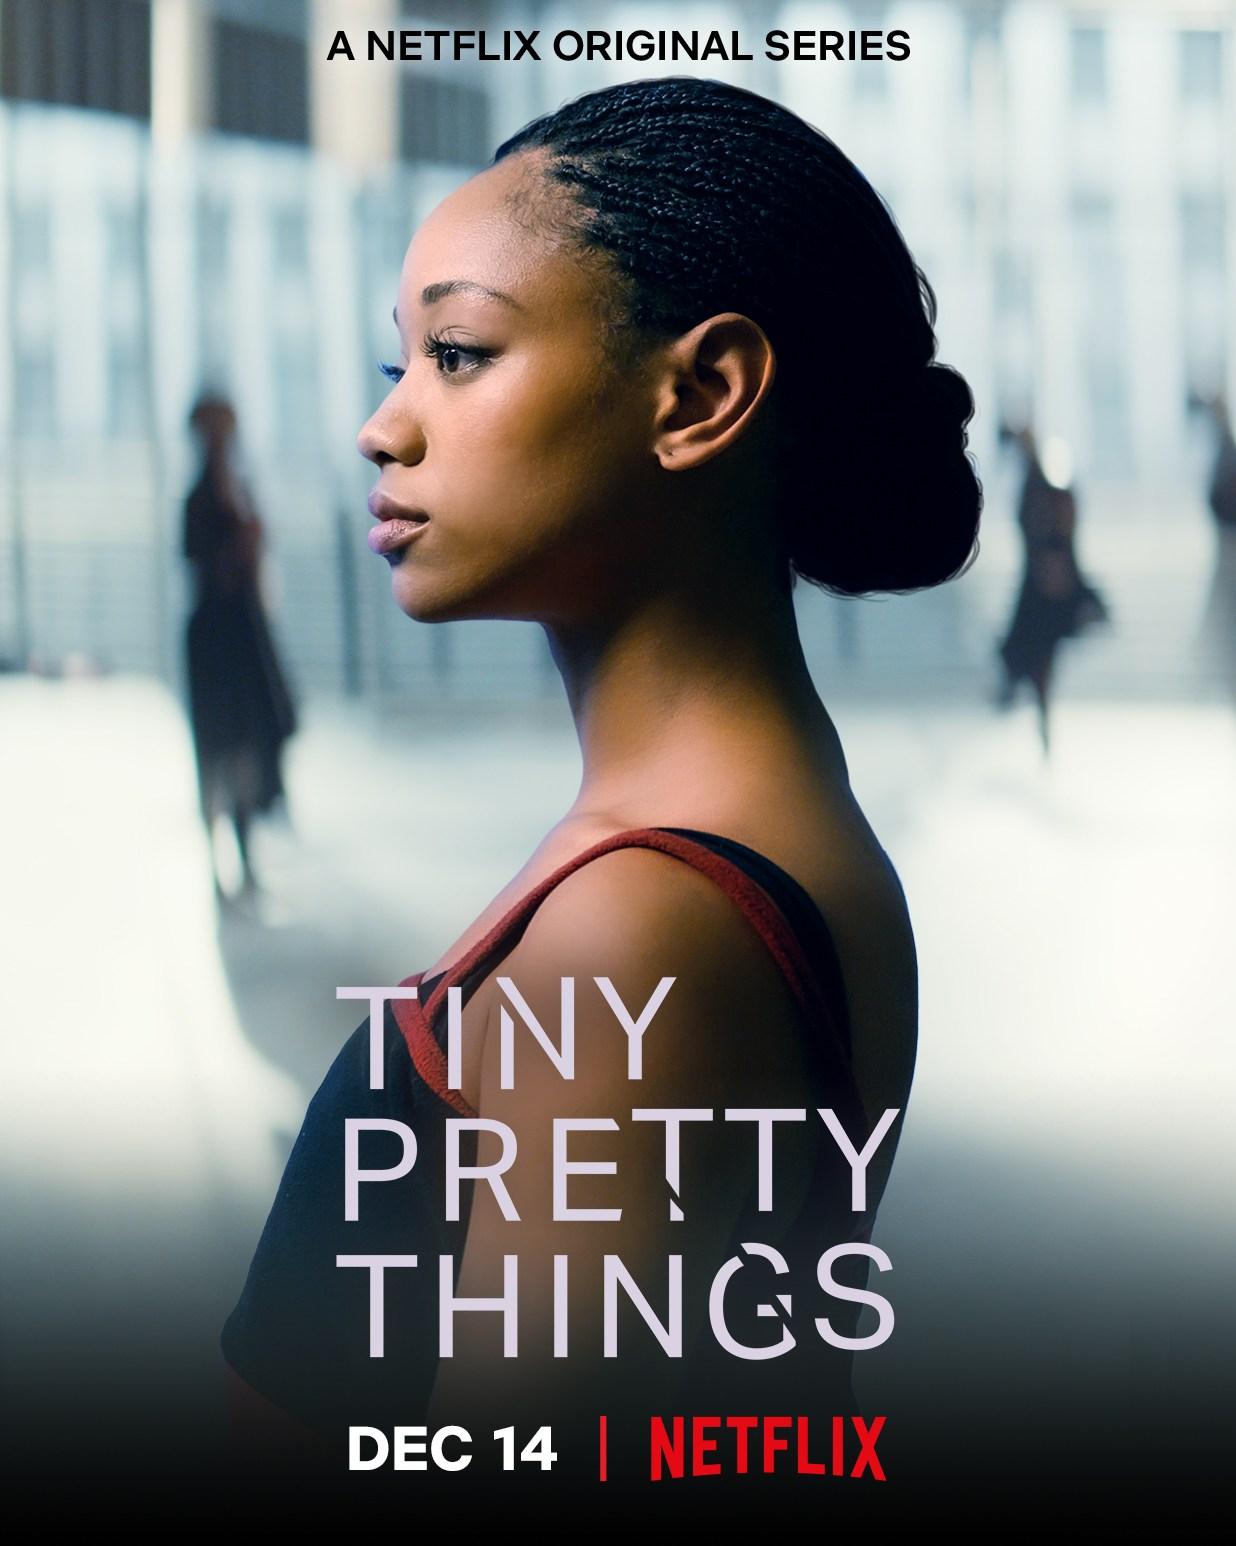 TinyPrettyThingsp2